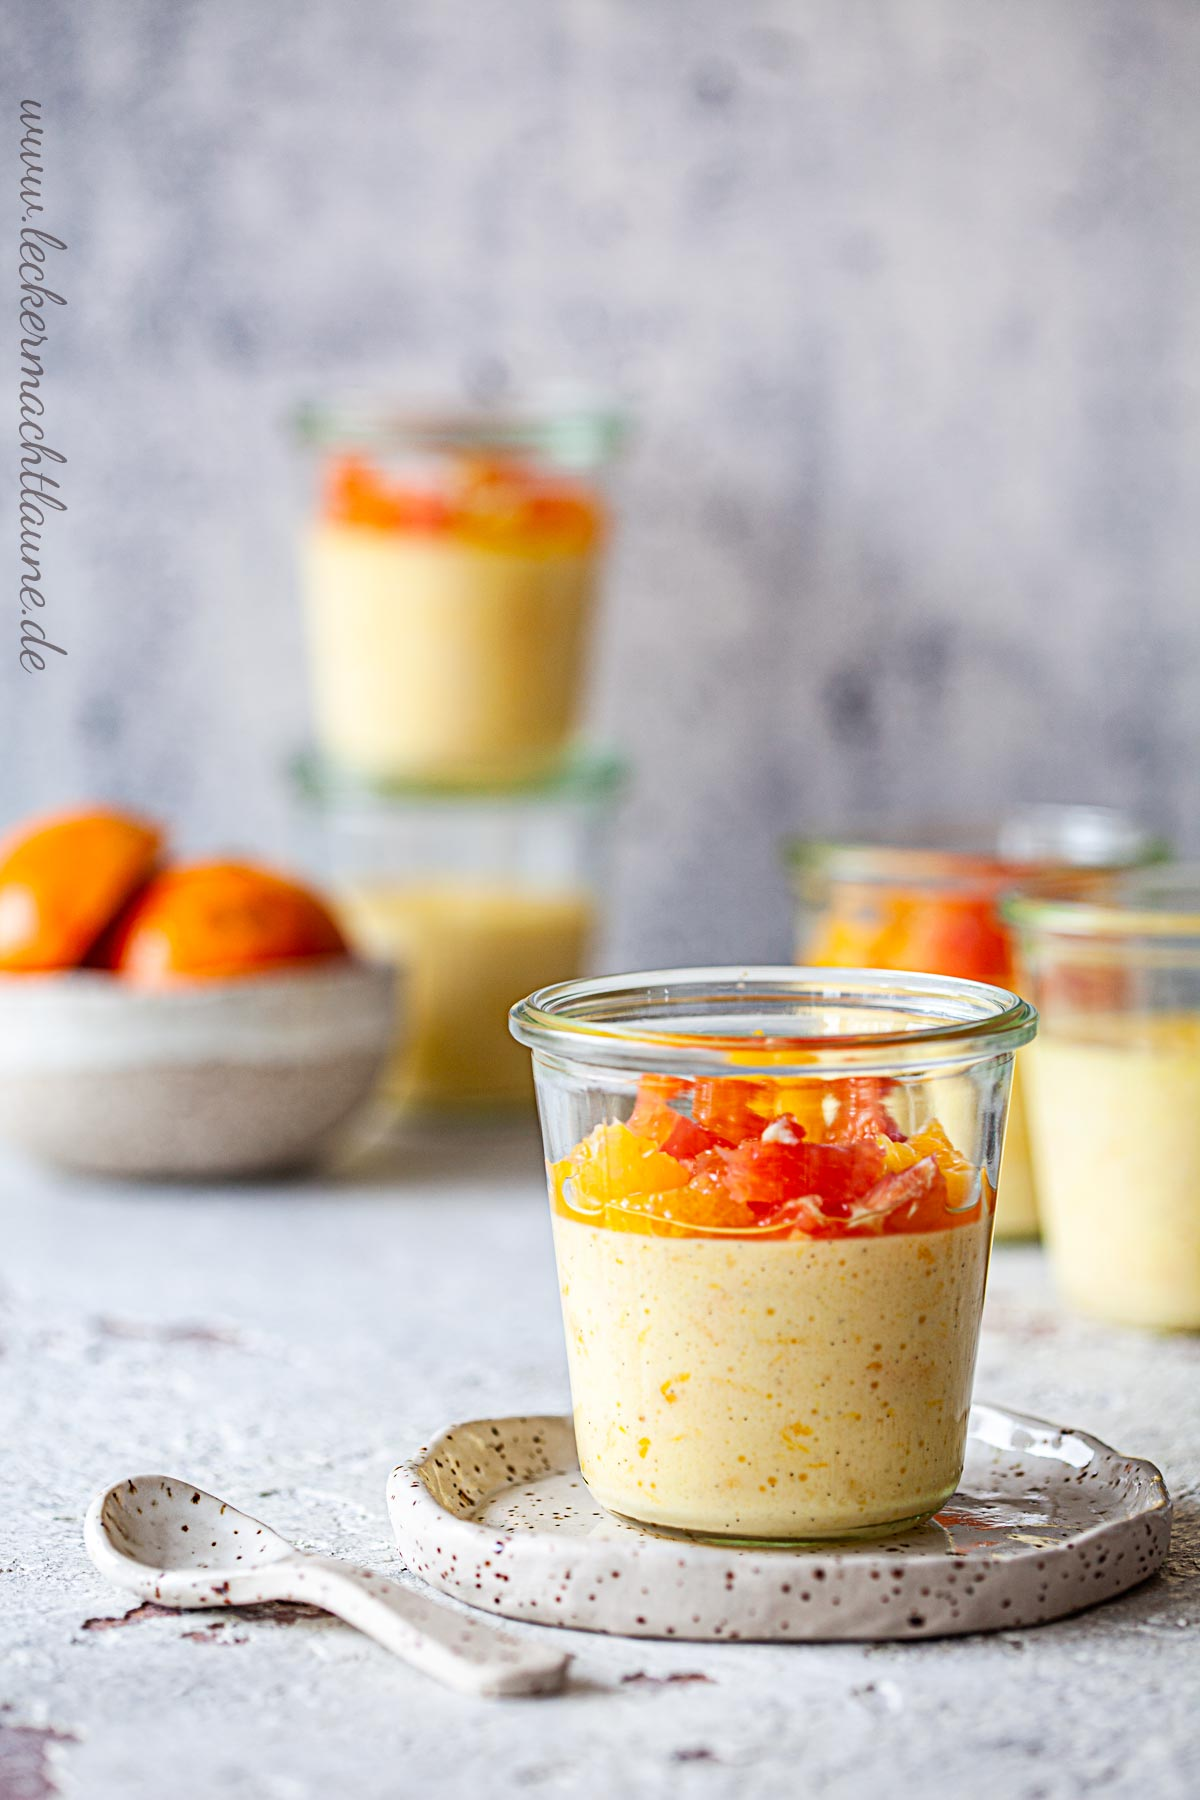 Orangencreme aus dem Ofen